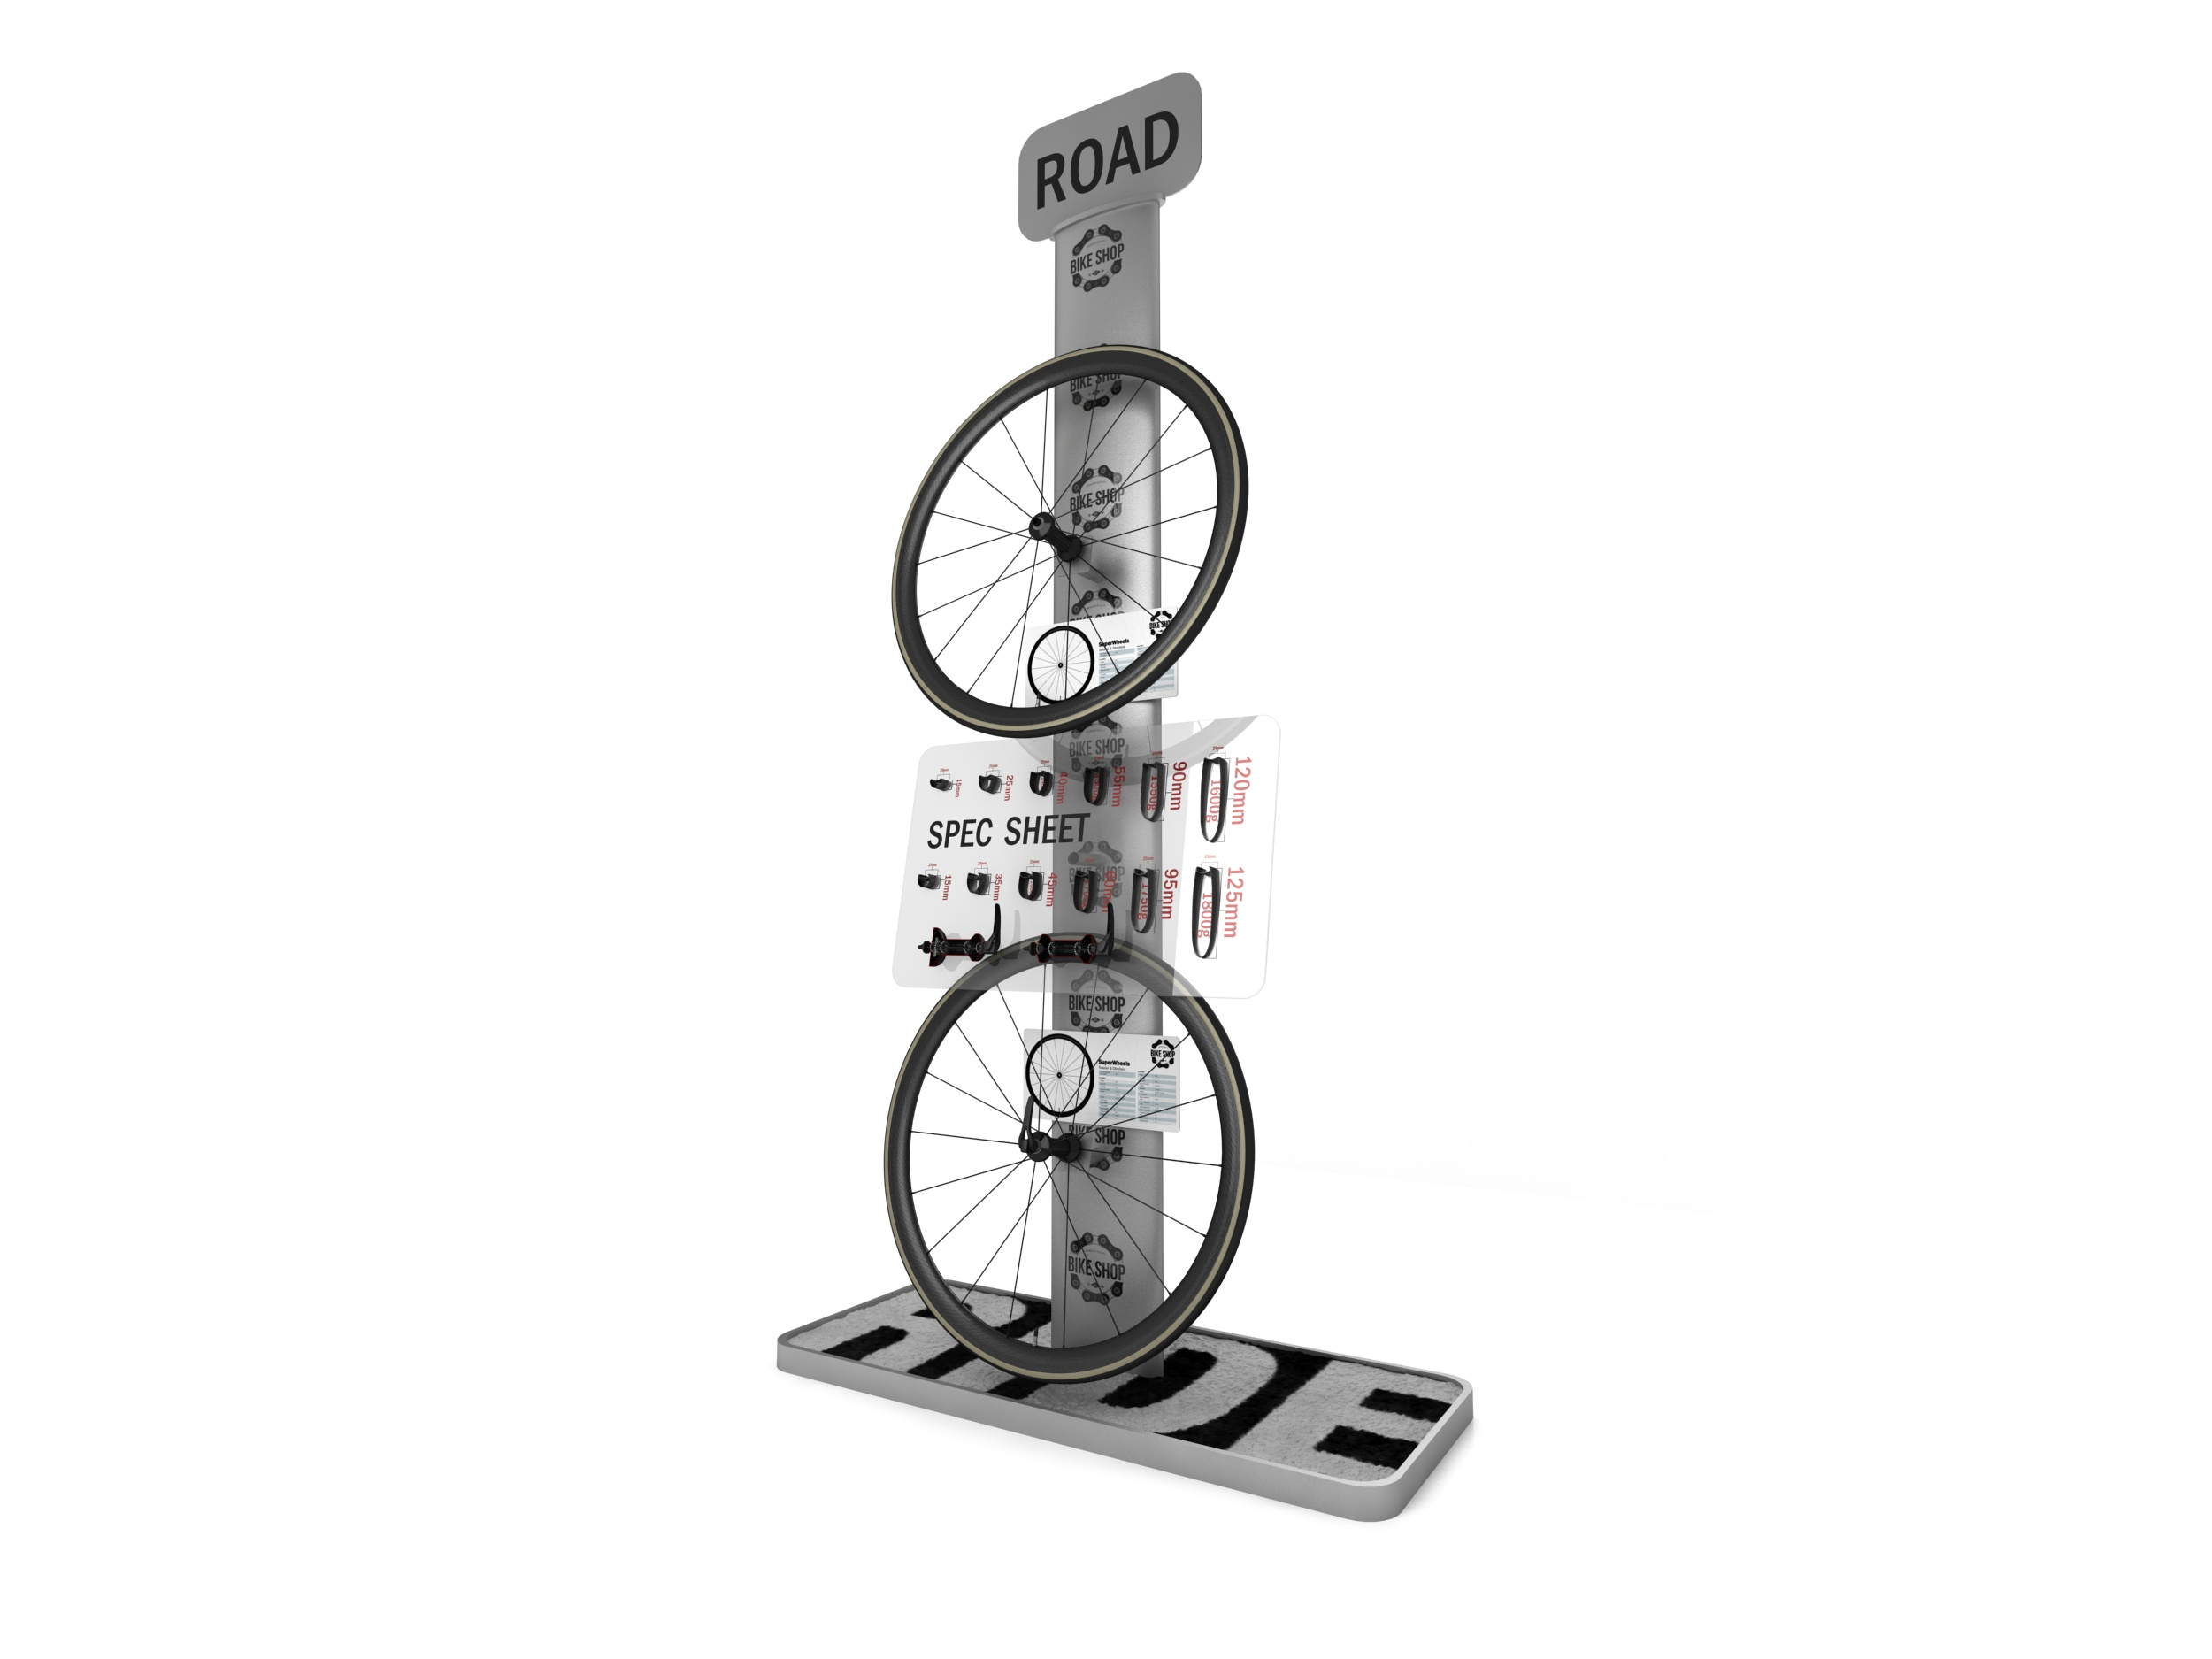 POS_Road Wheel Stand_013.jpg